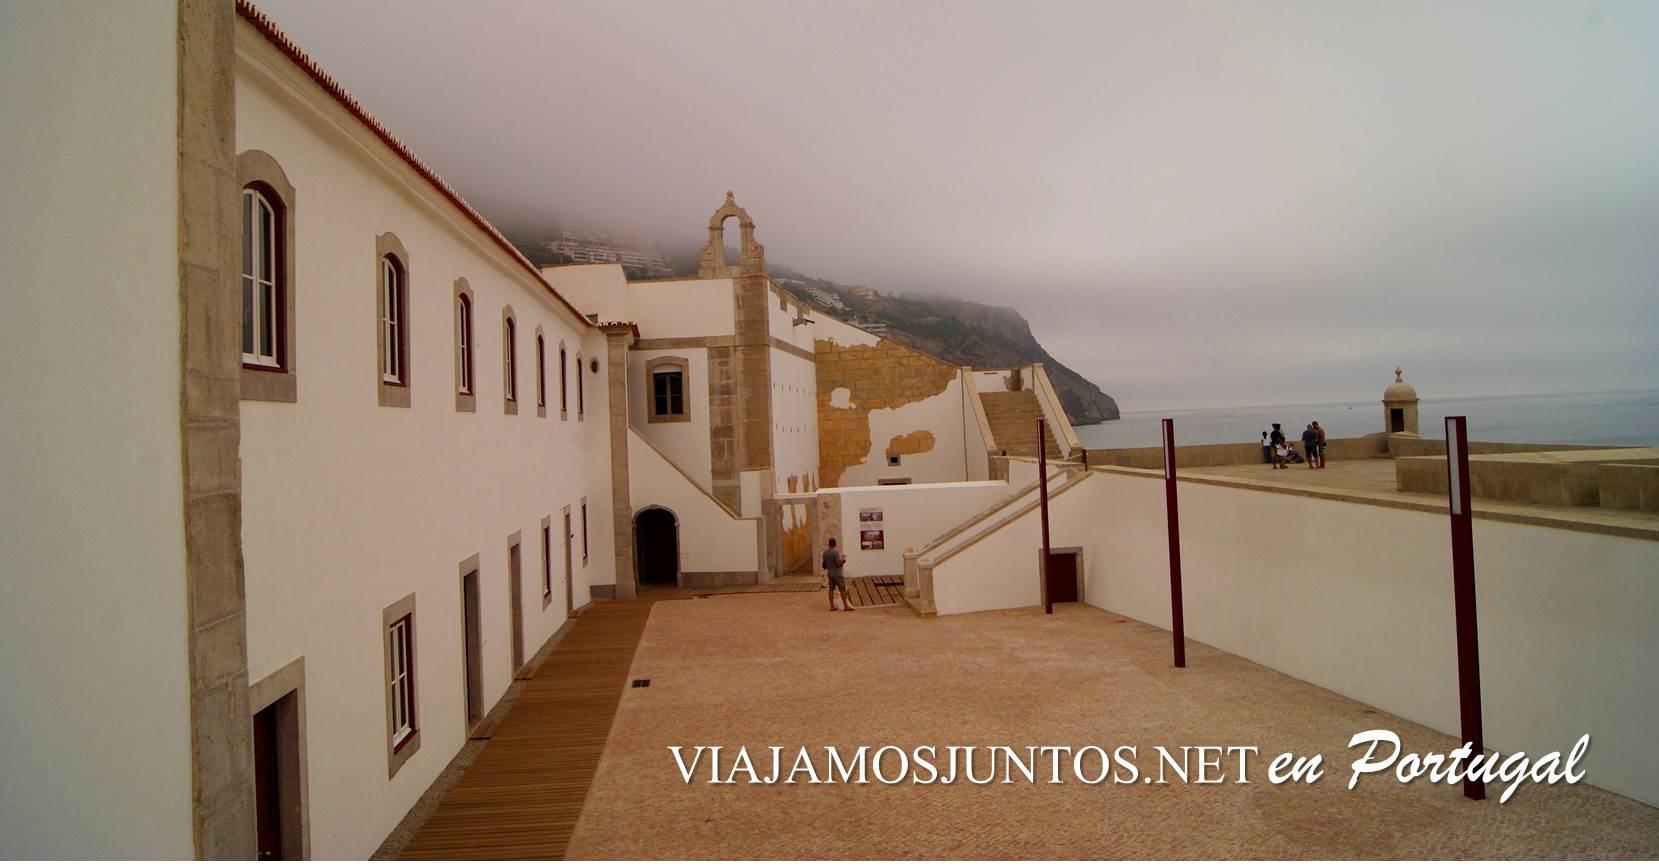 La fortaleza de Santiago, Sesimbra